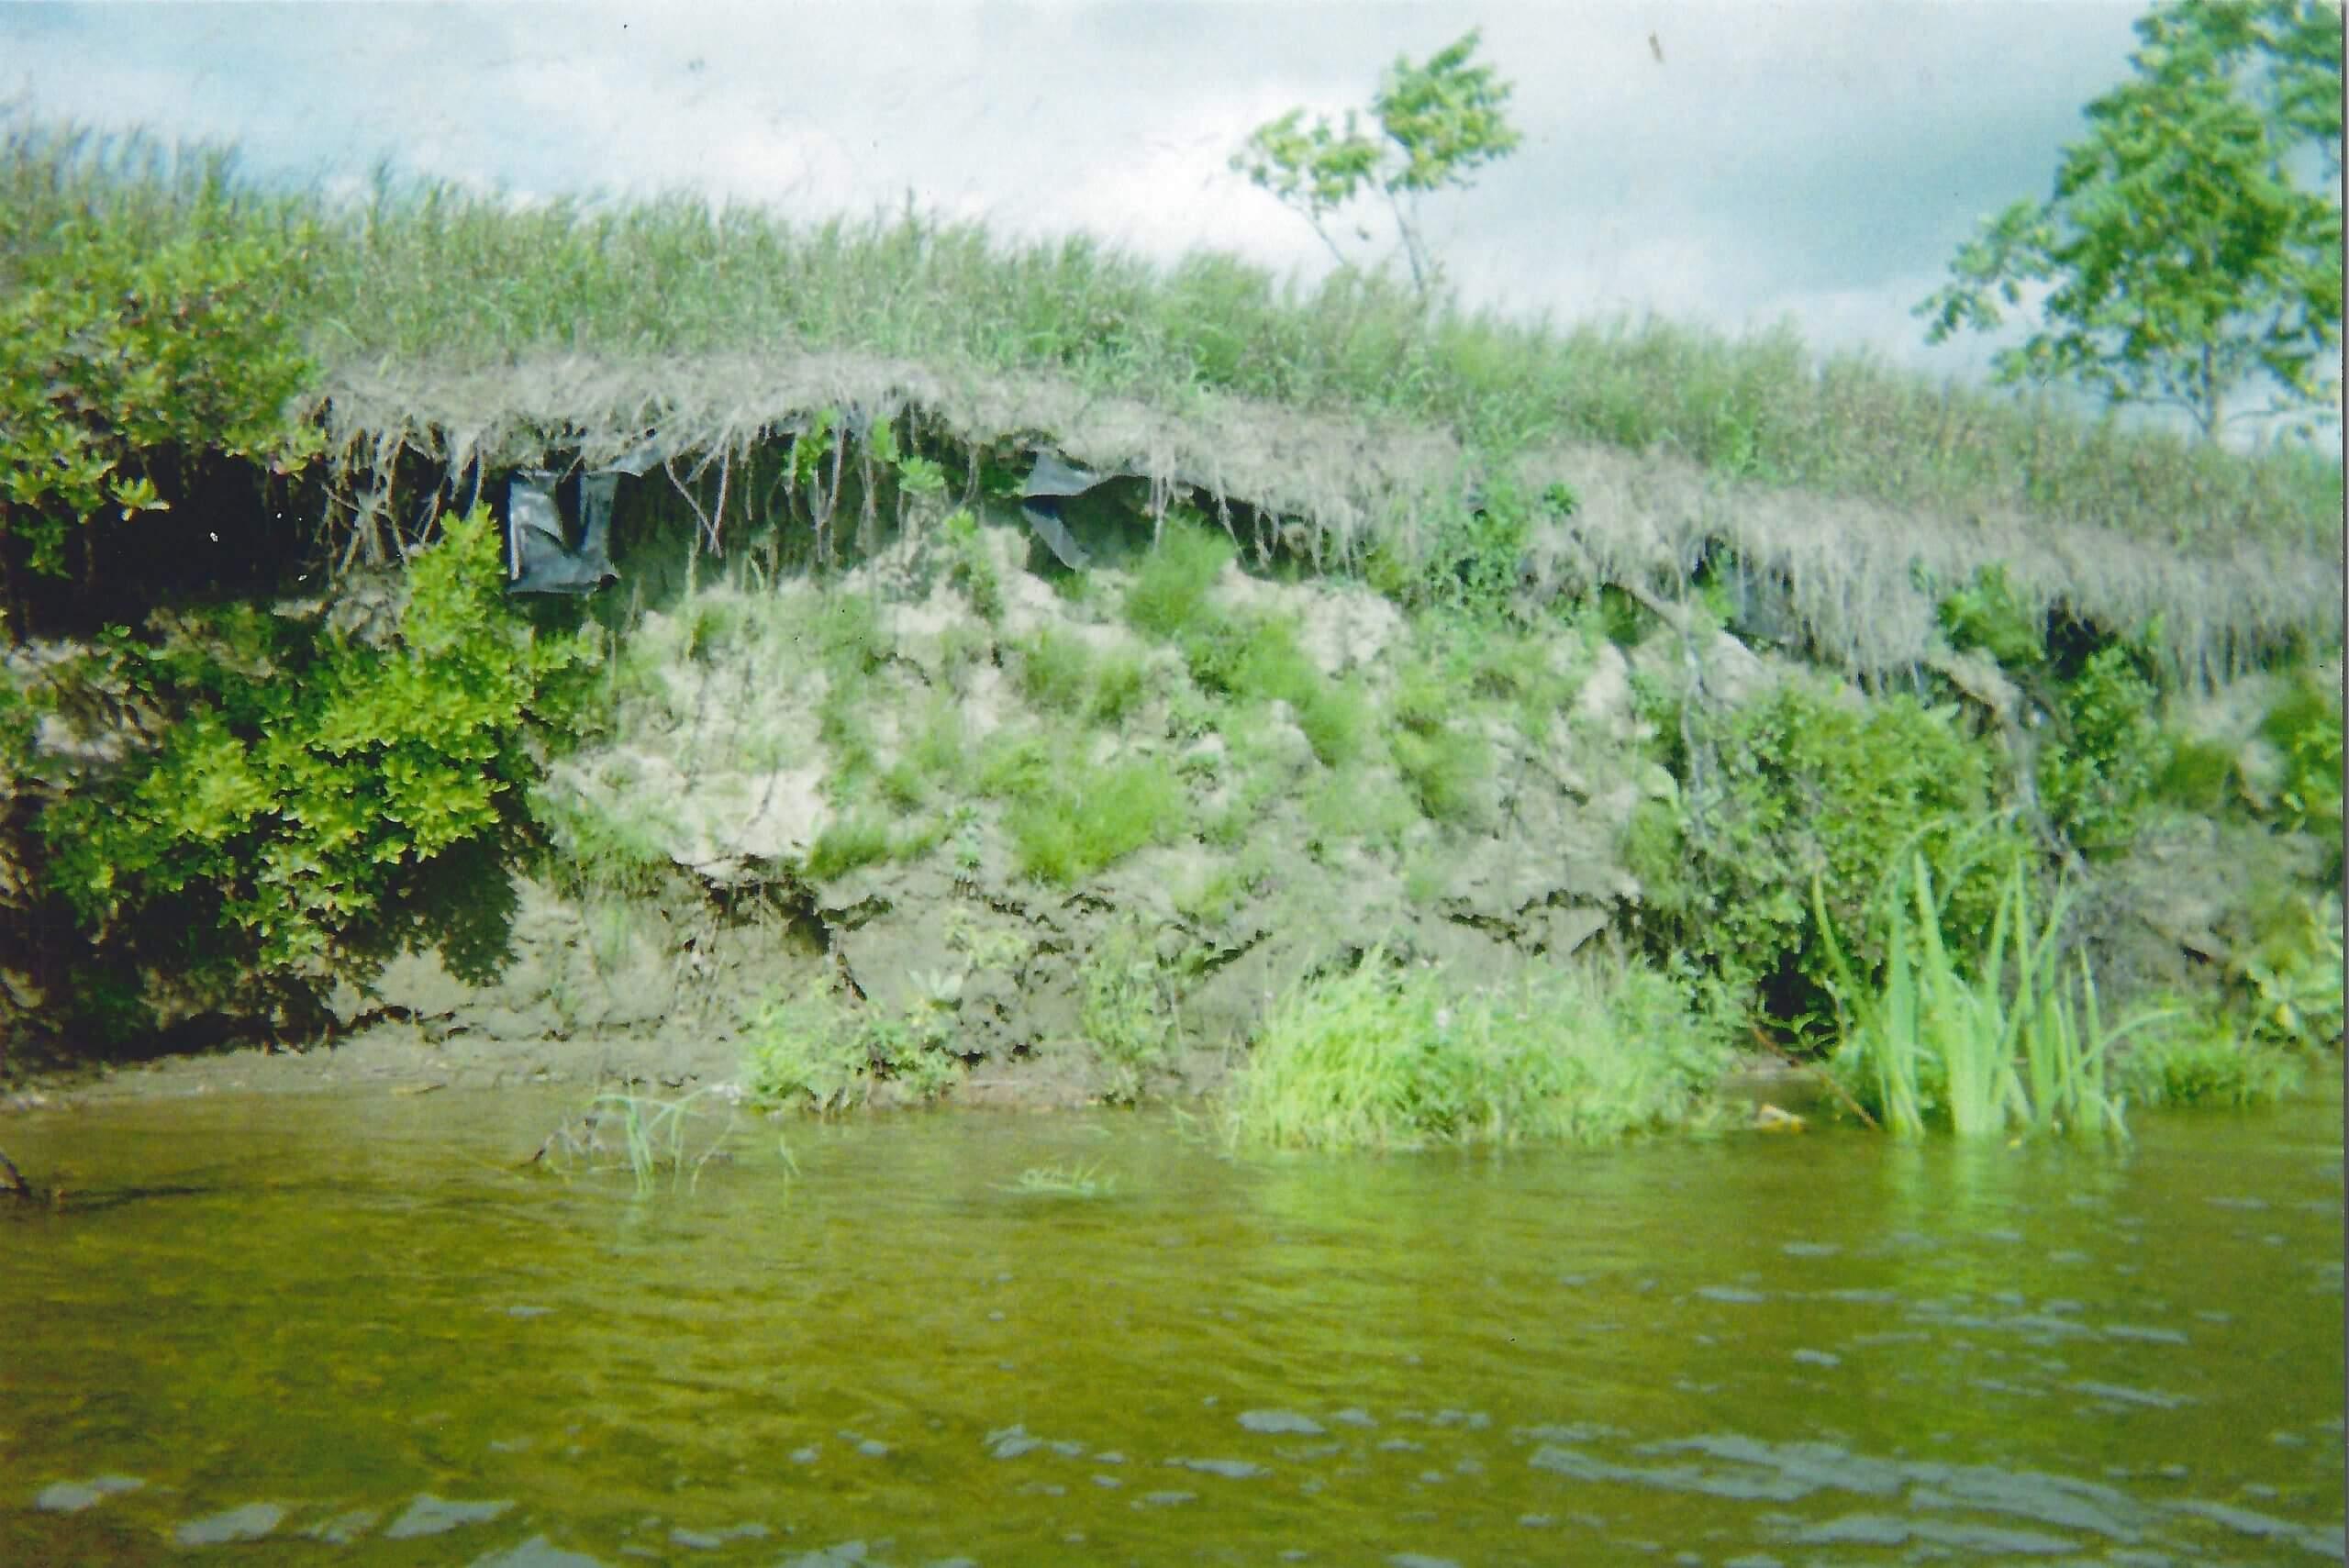 erosion on Stocking Farm in Fairlee, VT circa 1980s